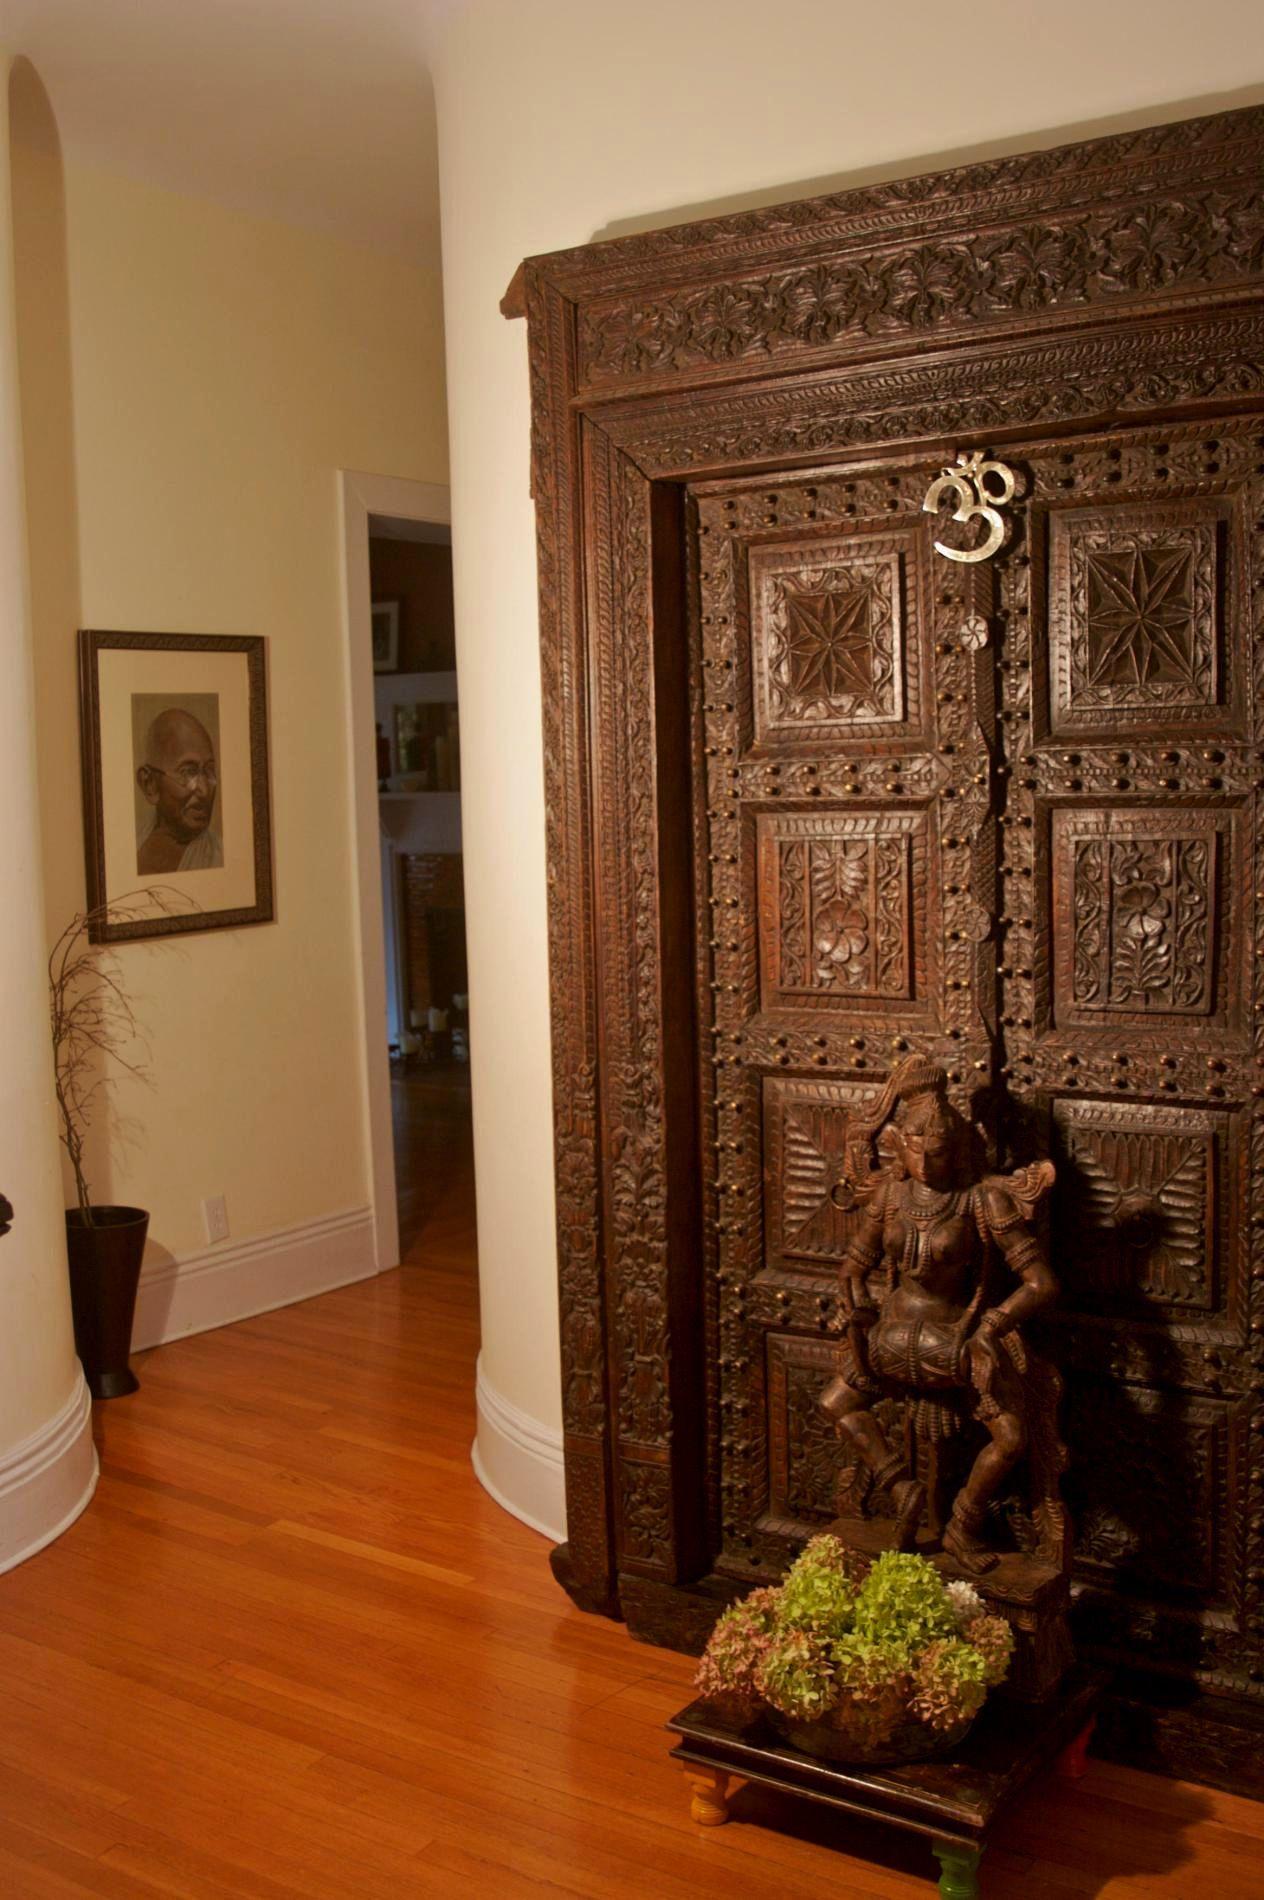 indian antique door designs - Indian Antique Door Designs Unique Pinterest Door Design